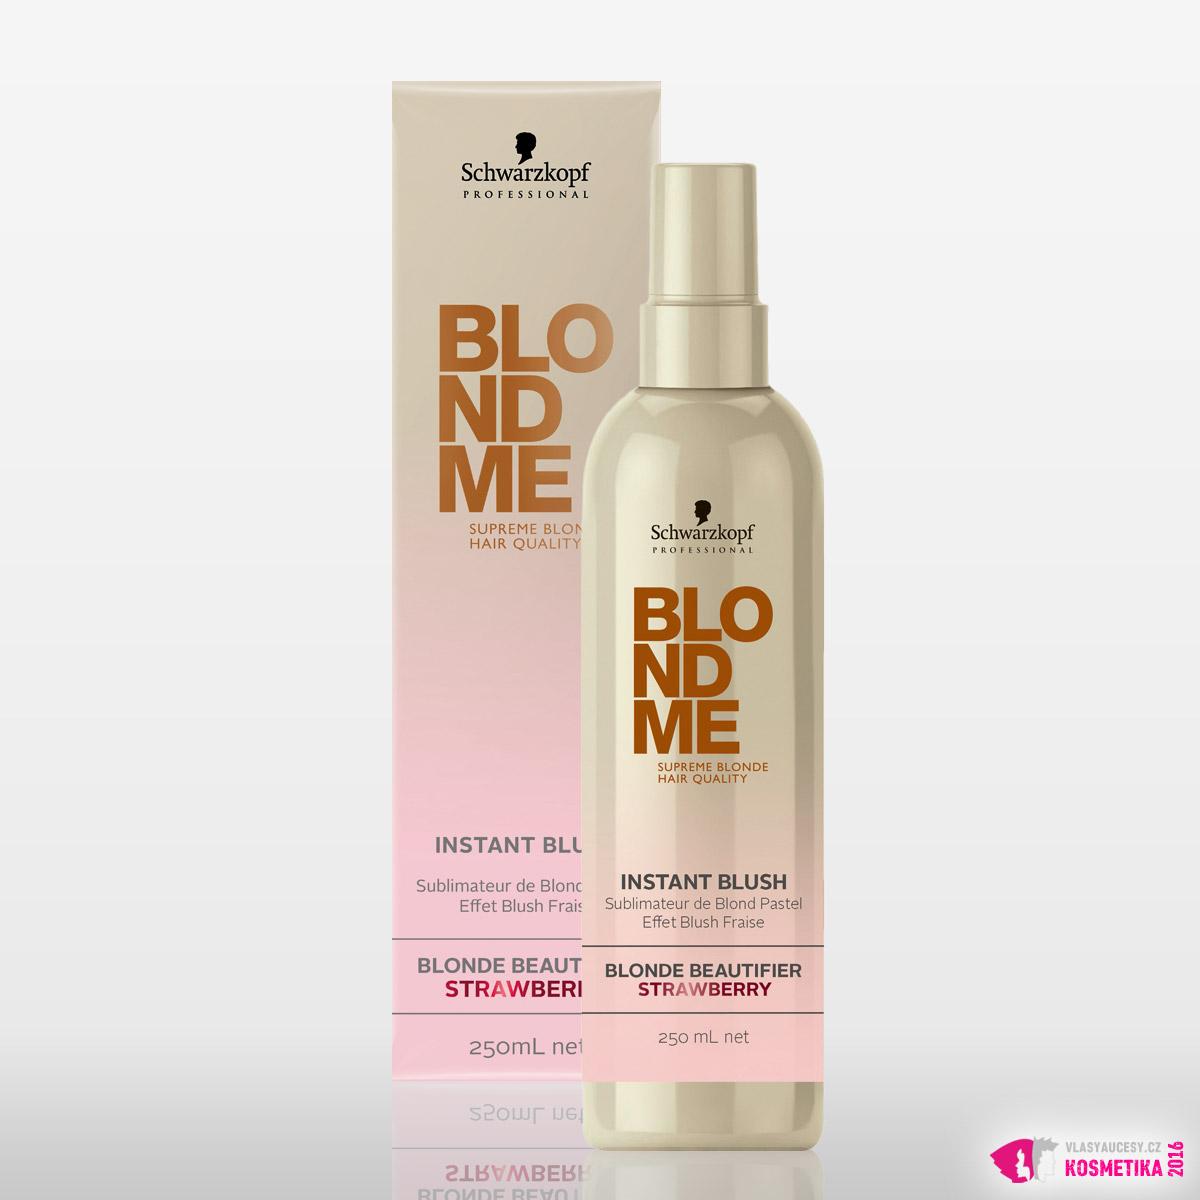 BlondMe Instant Blush - Blonde Beautifier Strawberry od Schwarzkopf Professional